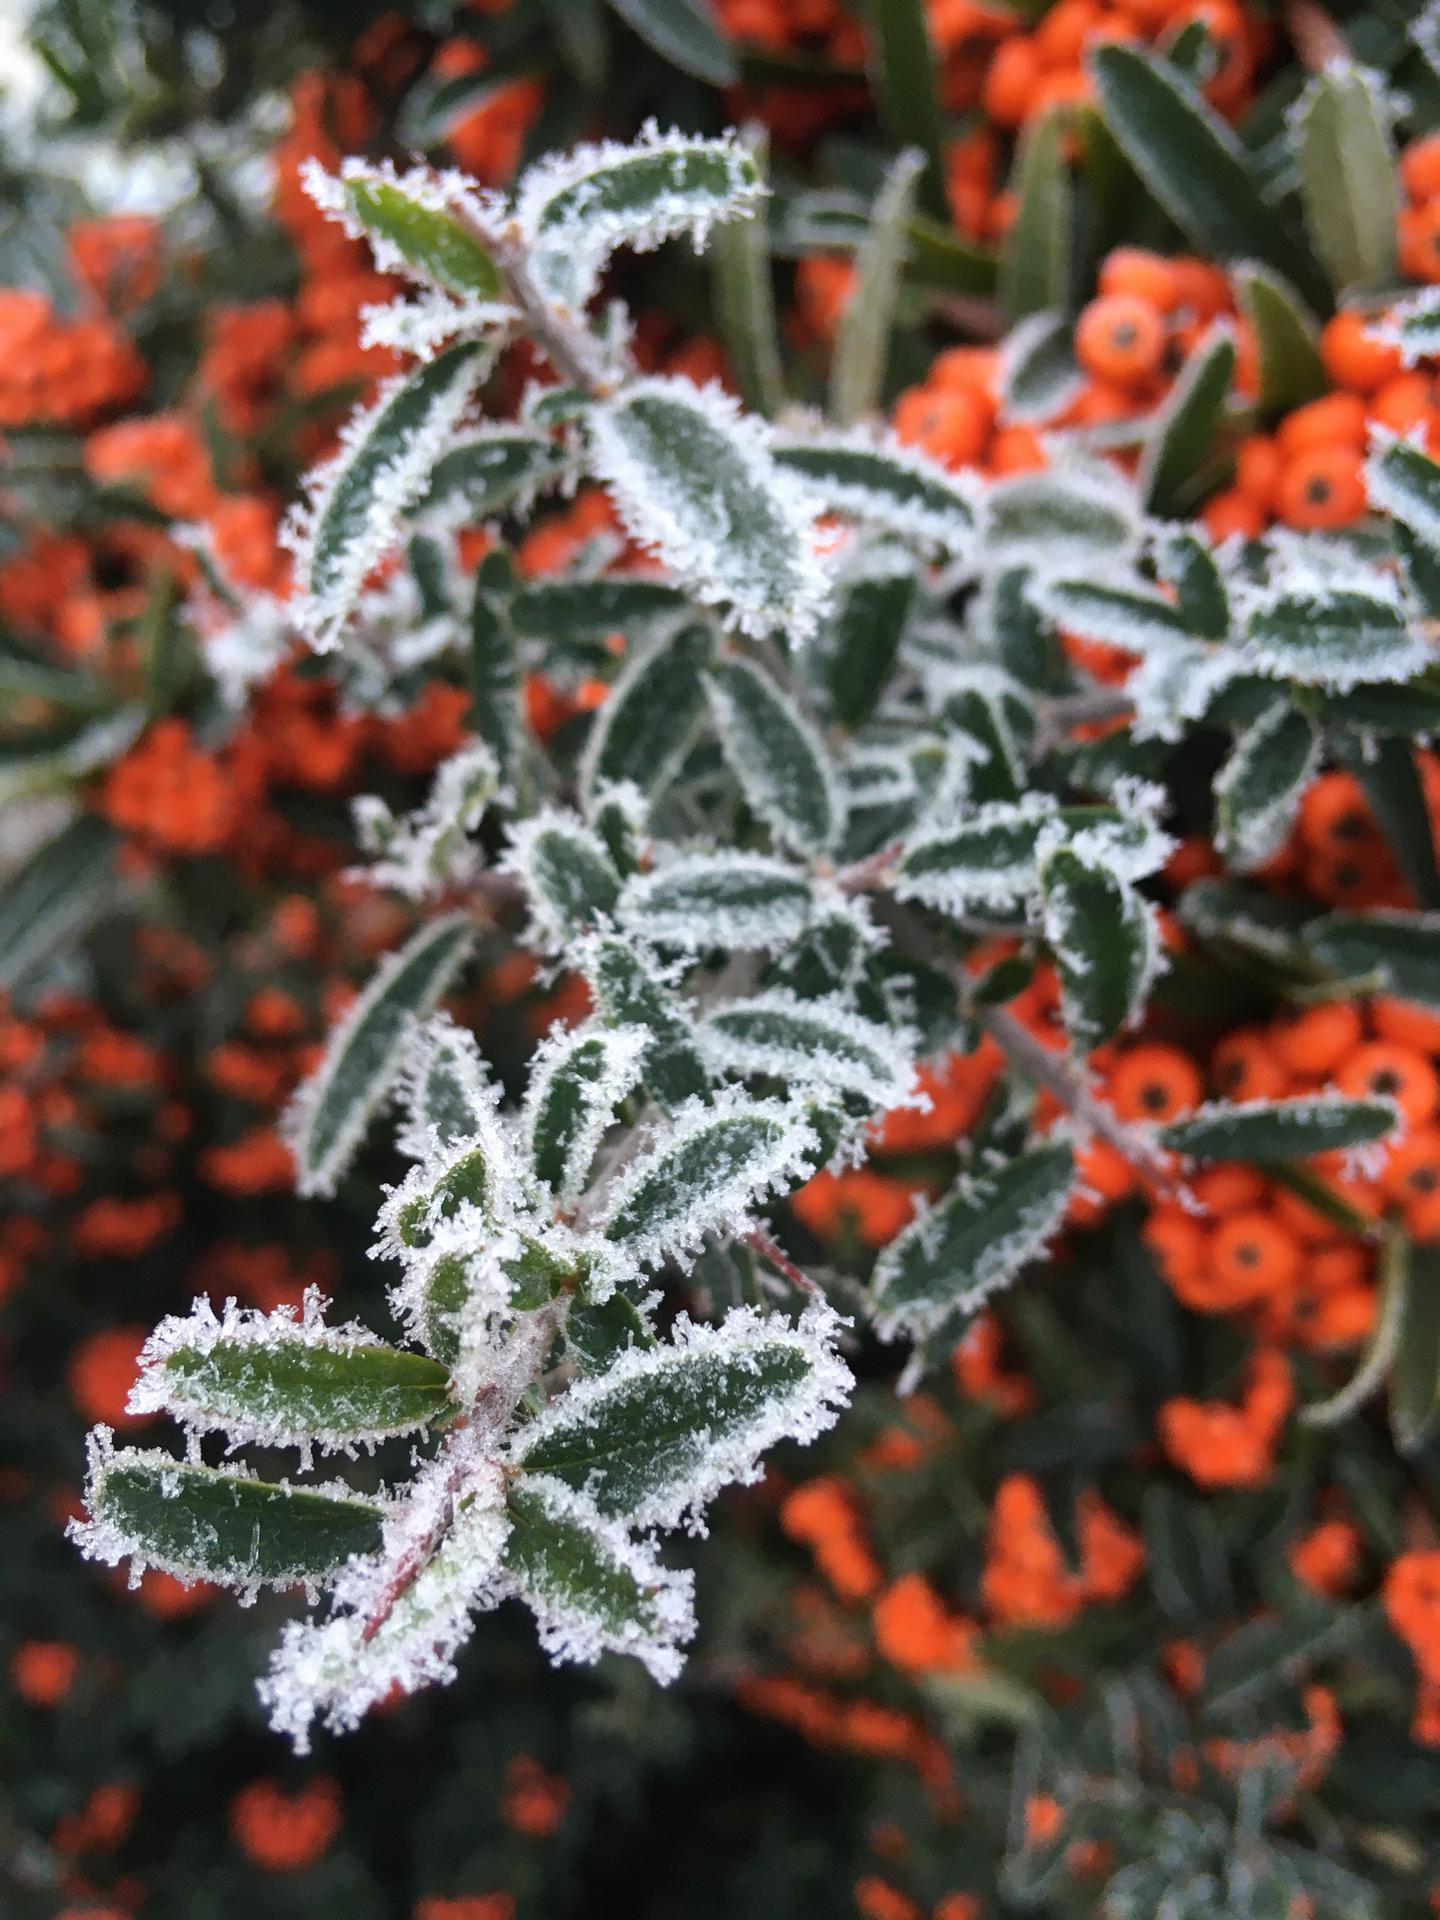 Zahrada 2020 - hlohyne - zimni krasavice 😊